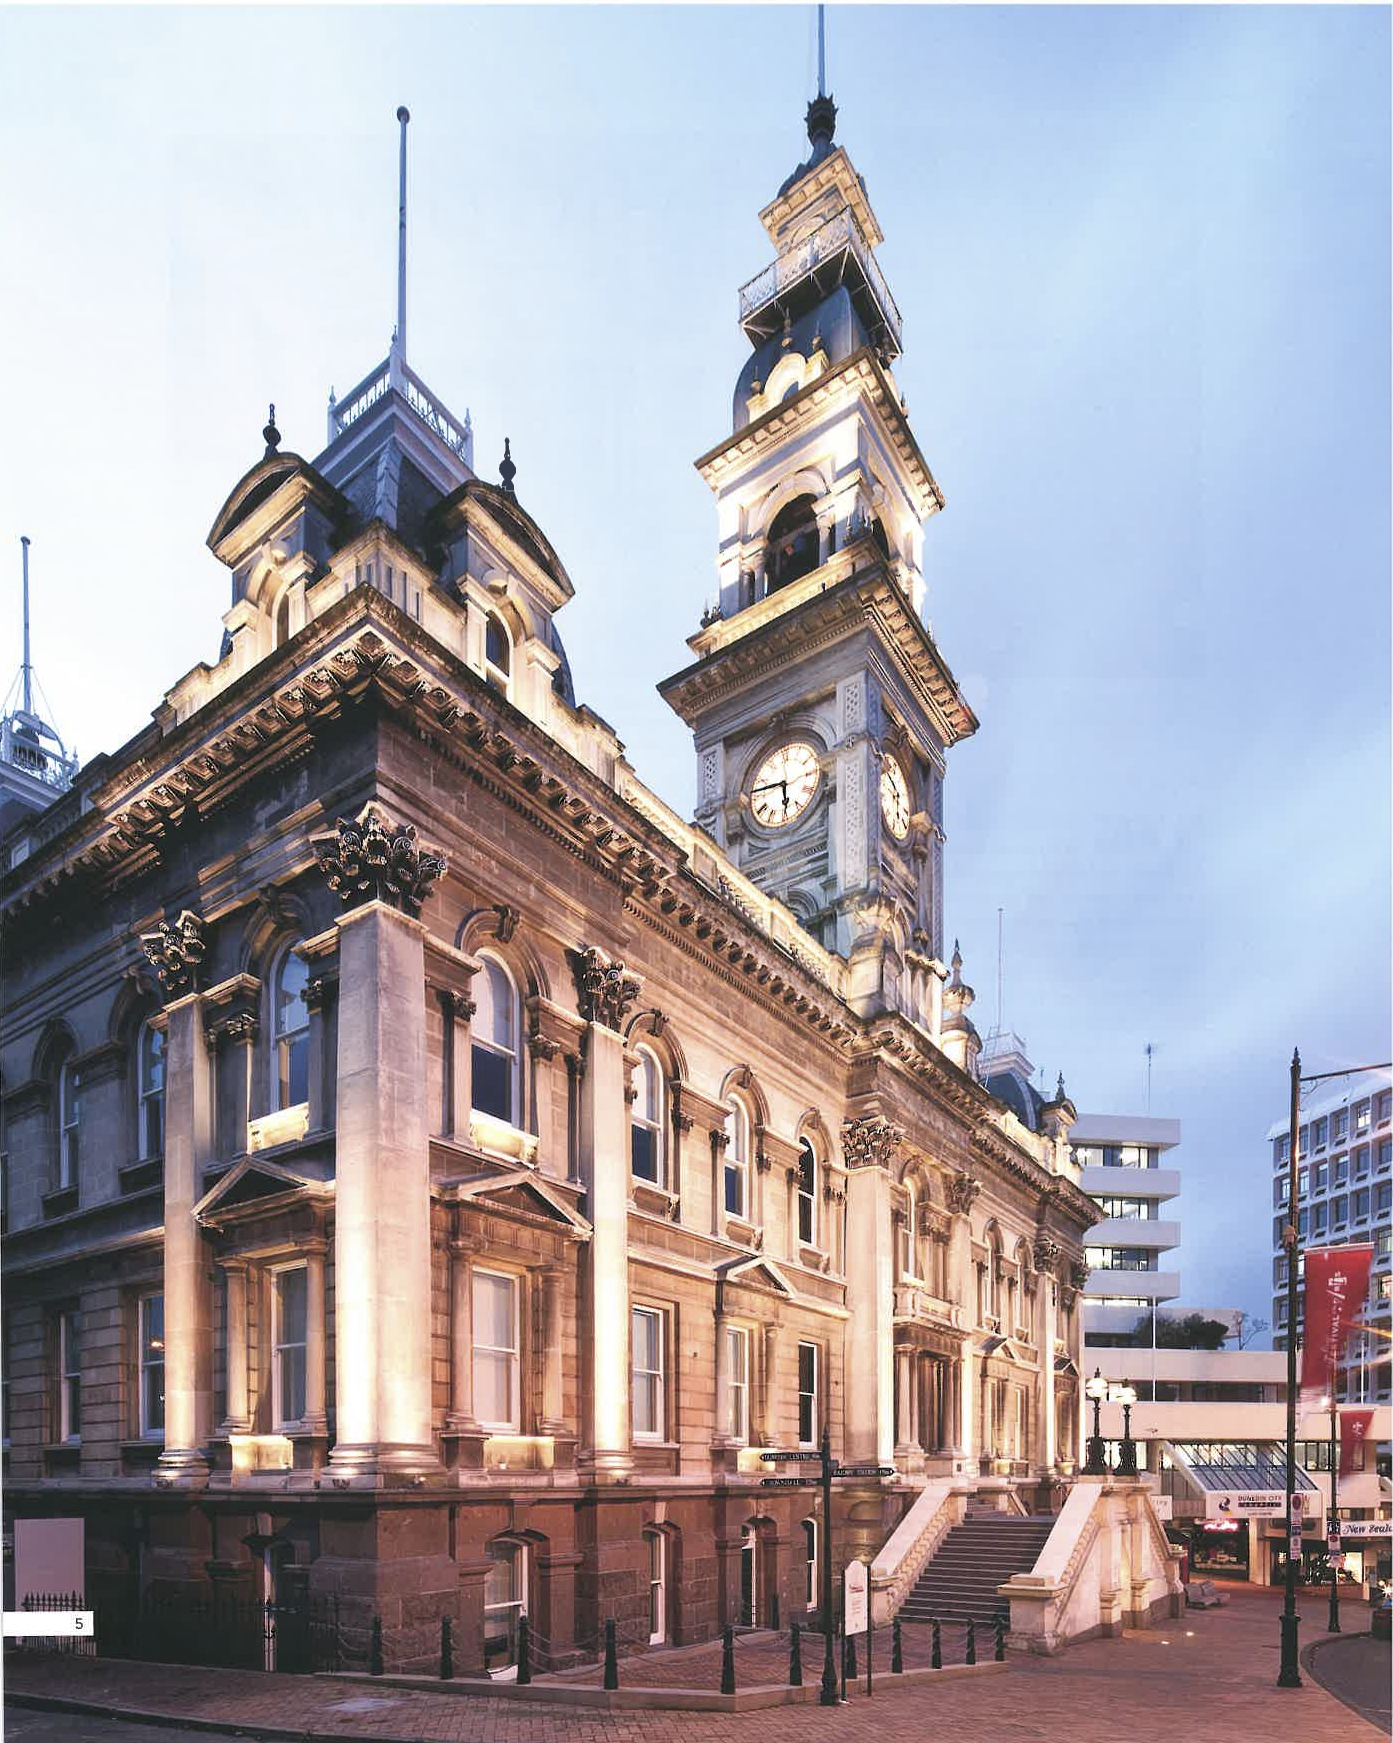 Dunedin Town Hall - Interiors Article Dec - Feb 2014 - 2015_5.jpg